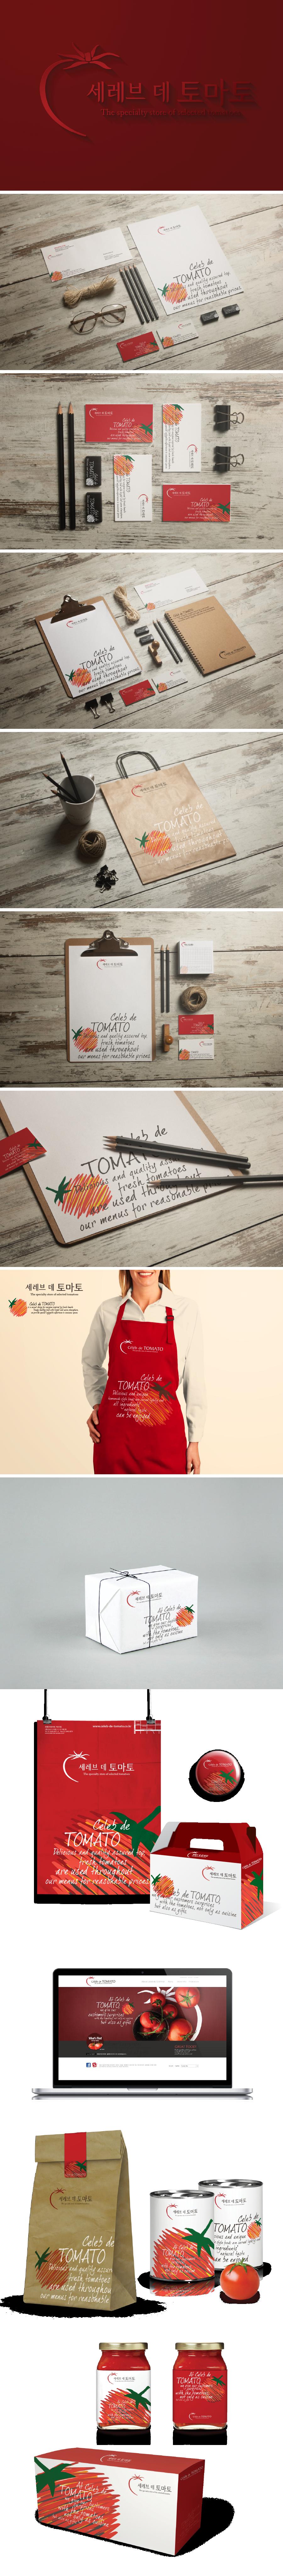 tomoto-si-total-900